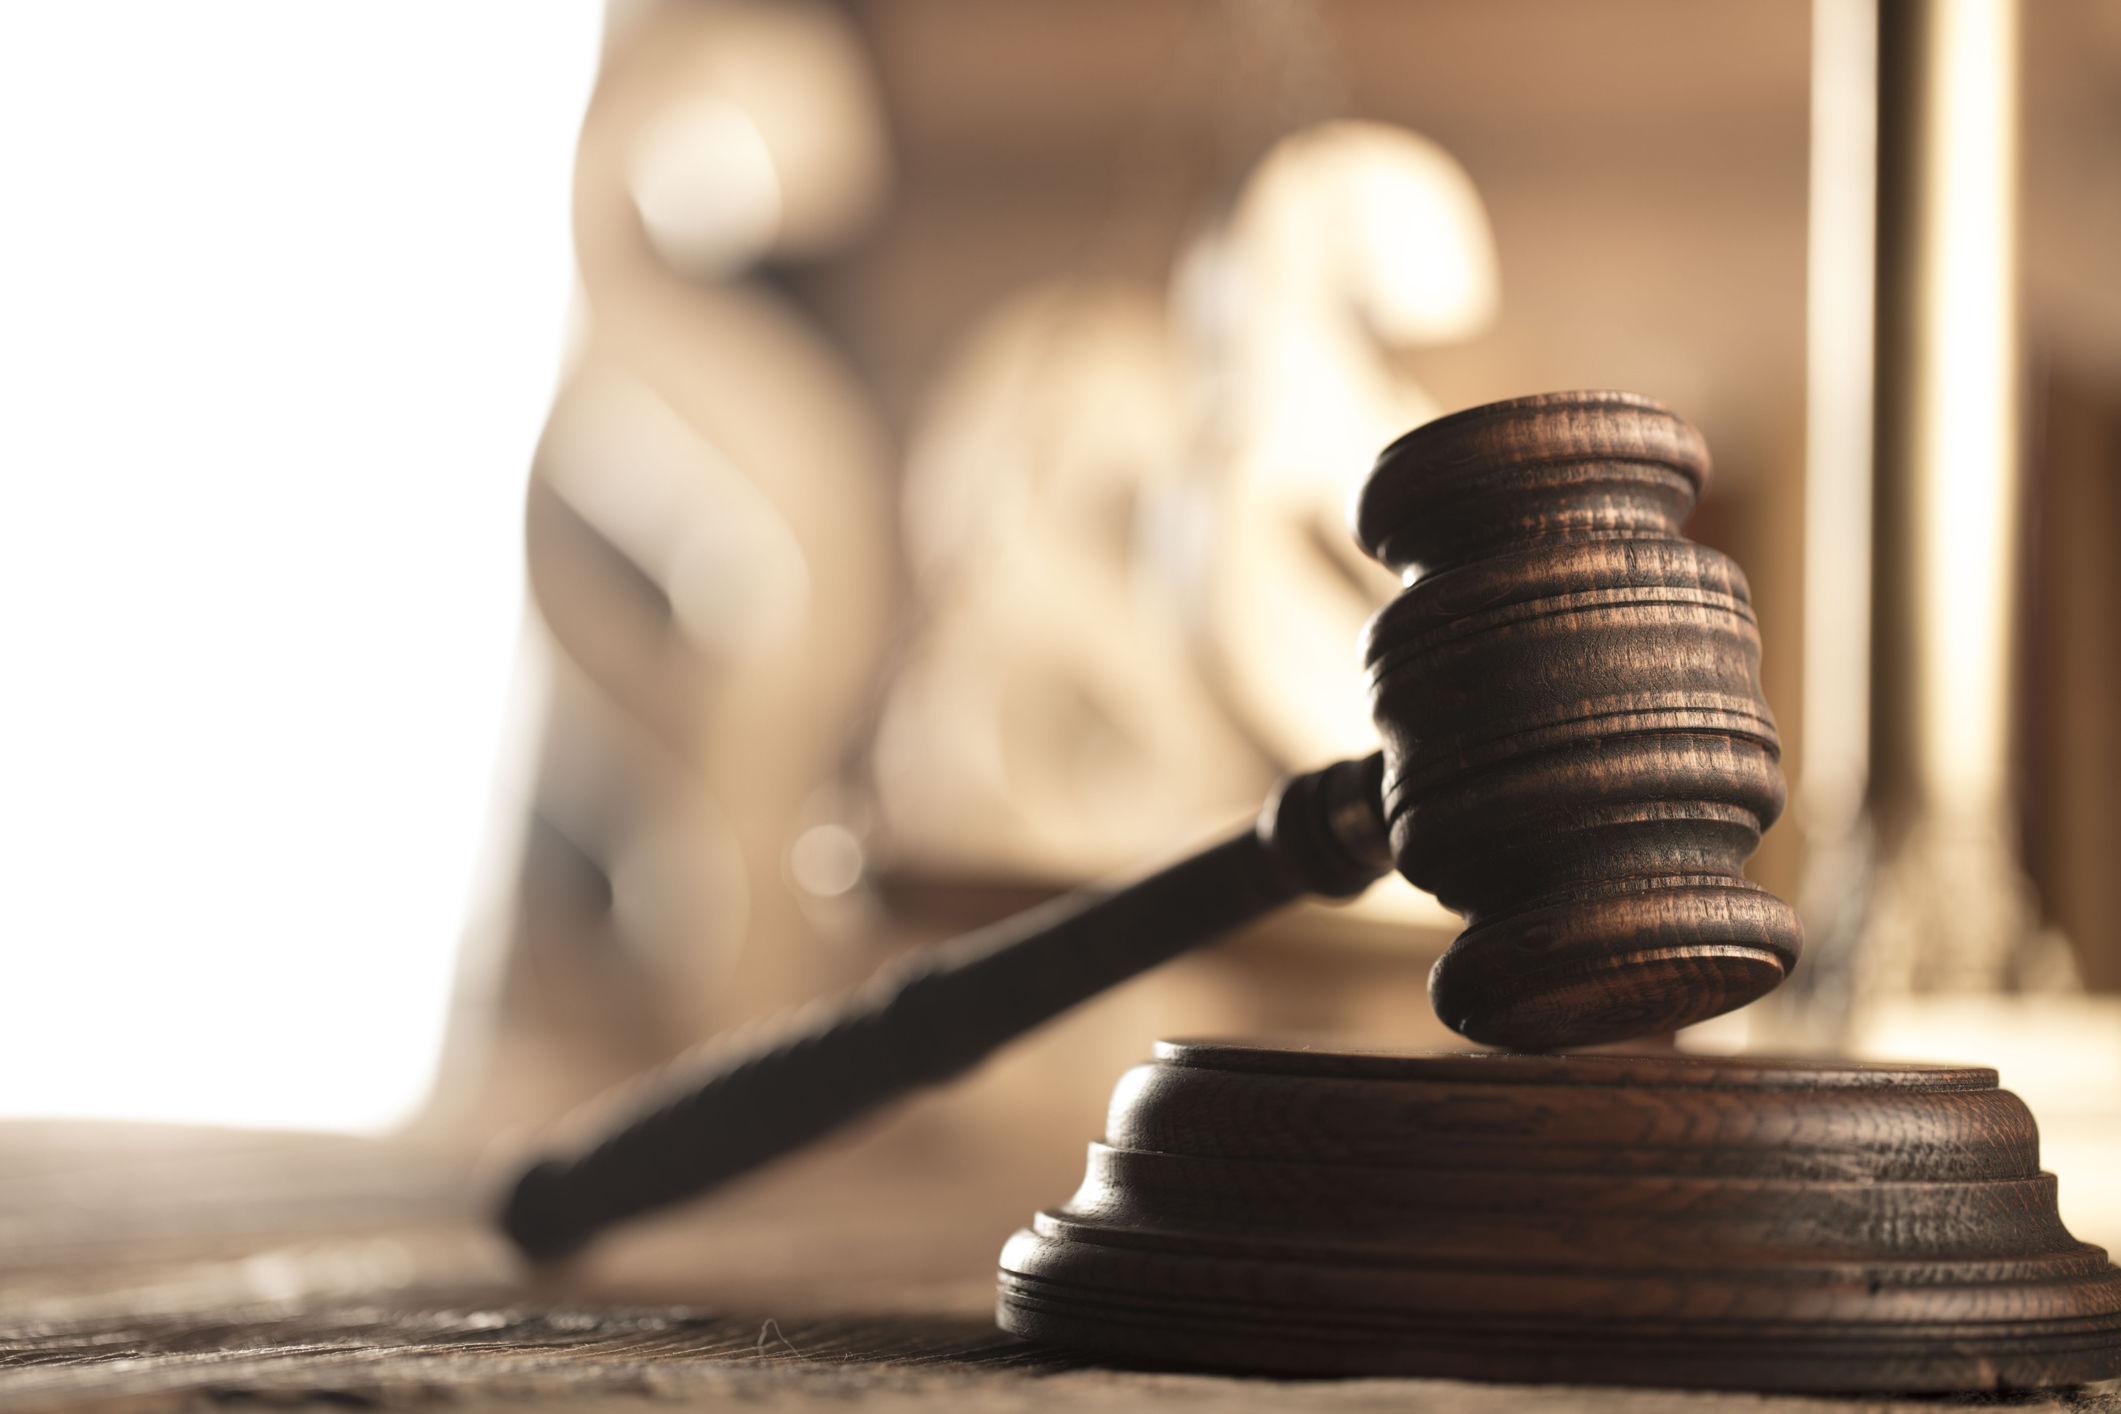 DC Drug Kingpin Rayful Edmond To Appear At Sentence